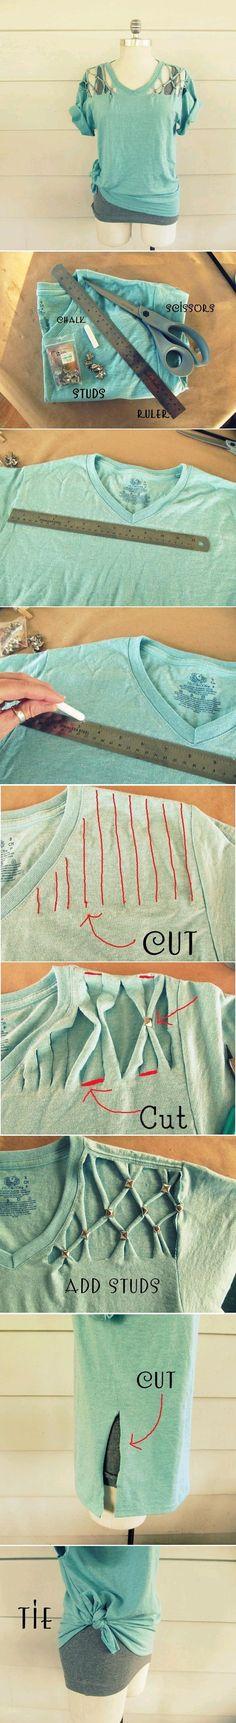 DIY Cool Studded T Shirt DIY Cool Studded T Shirt